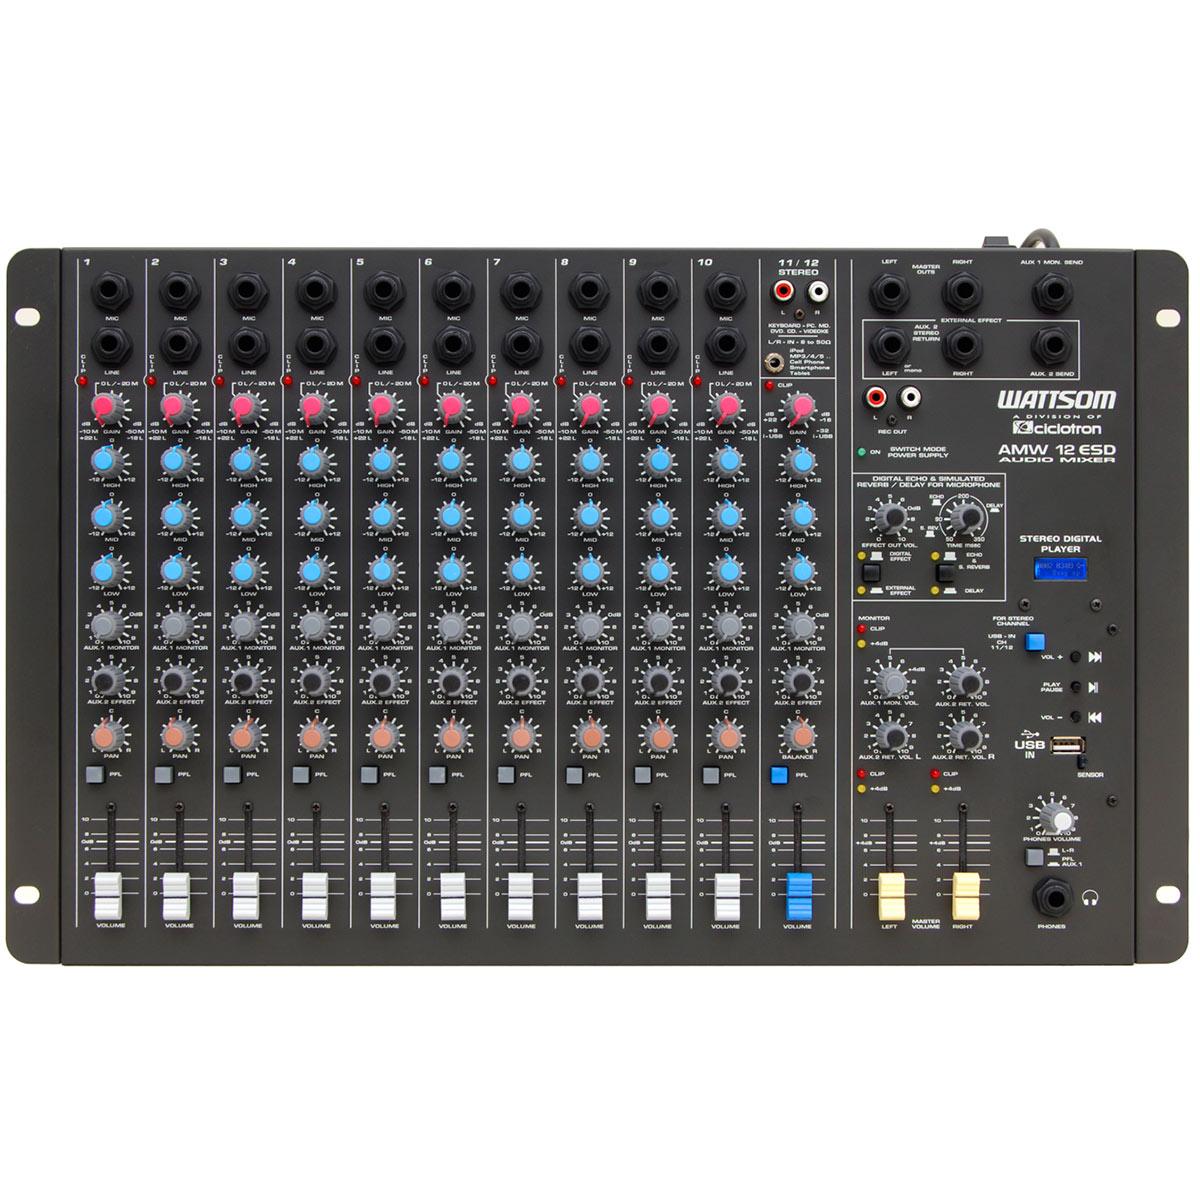 Mesa de Som 12 Canais P10 Balanceados c/ USB Play / Efeito / 2 Auxiliares - AMW 12 ESD Ciclotron